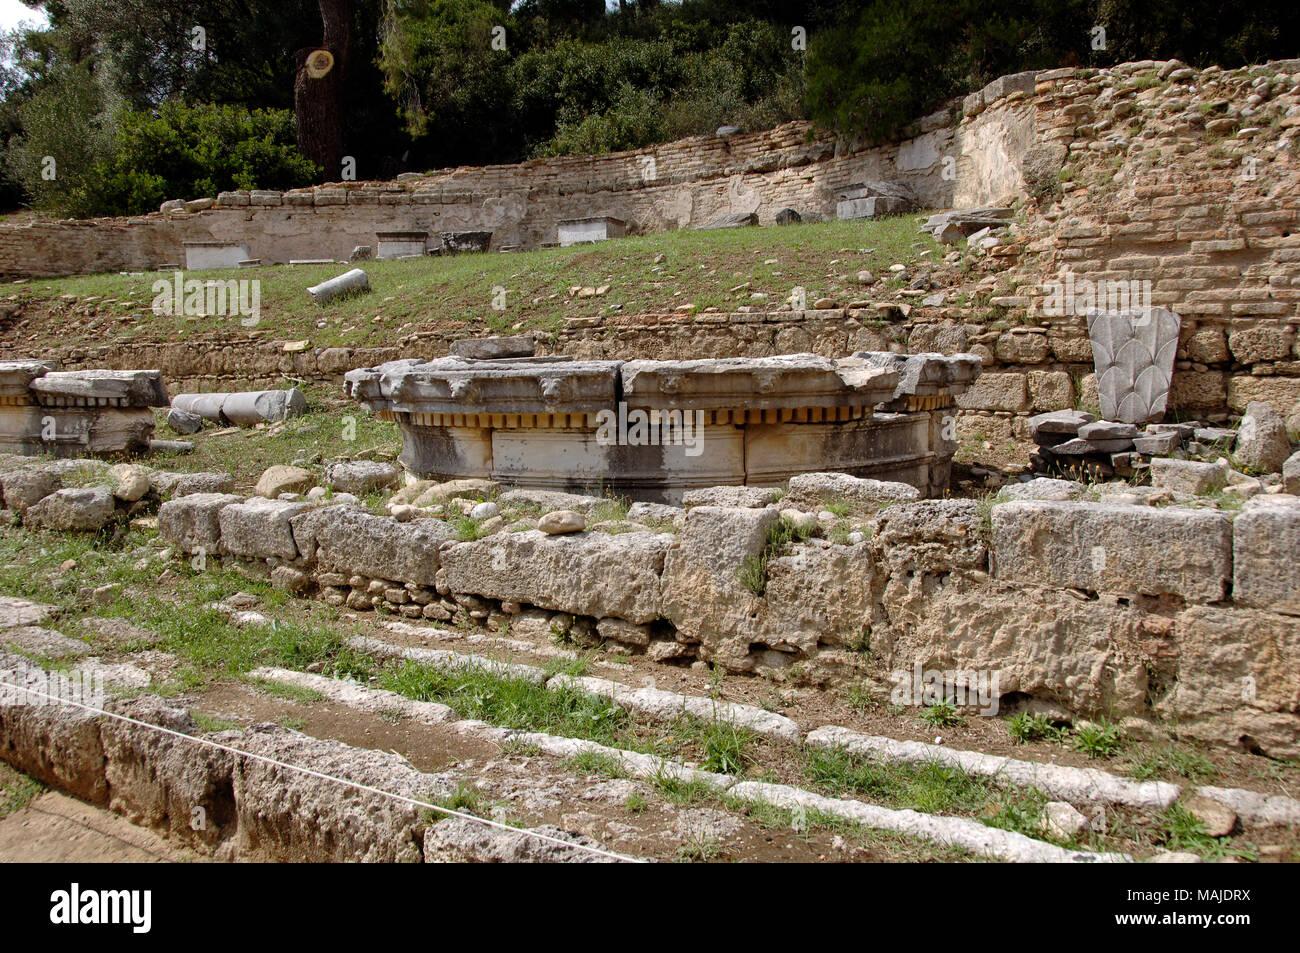 Greece. Olympia. Nymphaeum of Herodes Atticus.ca.160 AD. Roman period. View of ruins. Elis Region, Peloponnese. - Stock Image